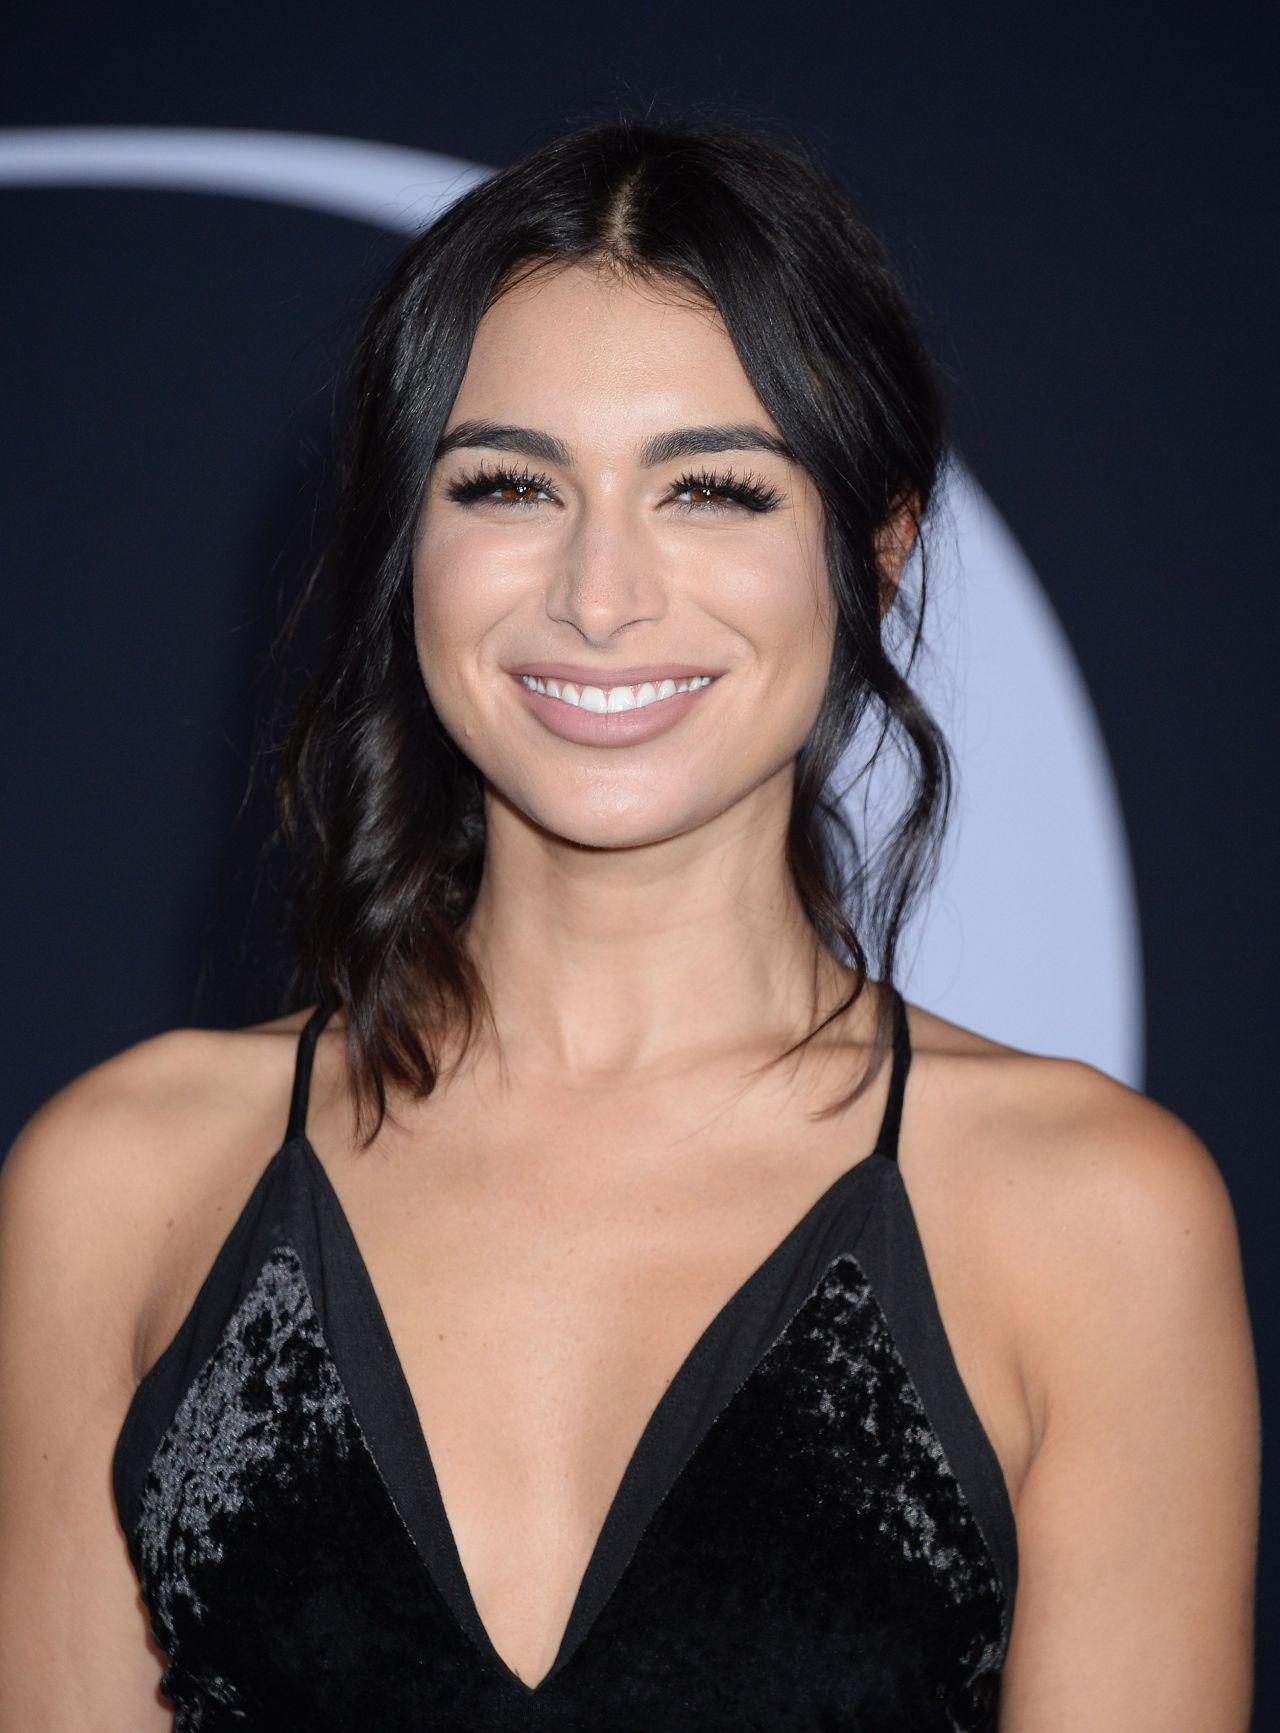 Ashley Laconetti